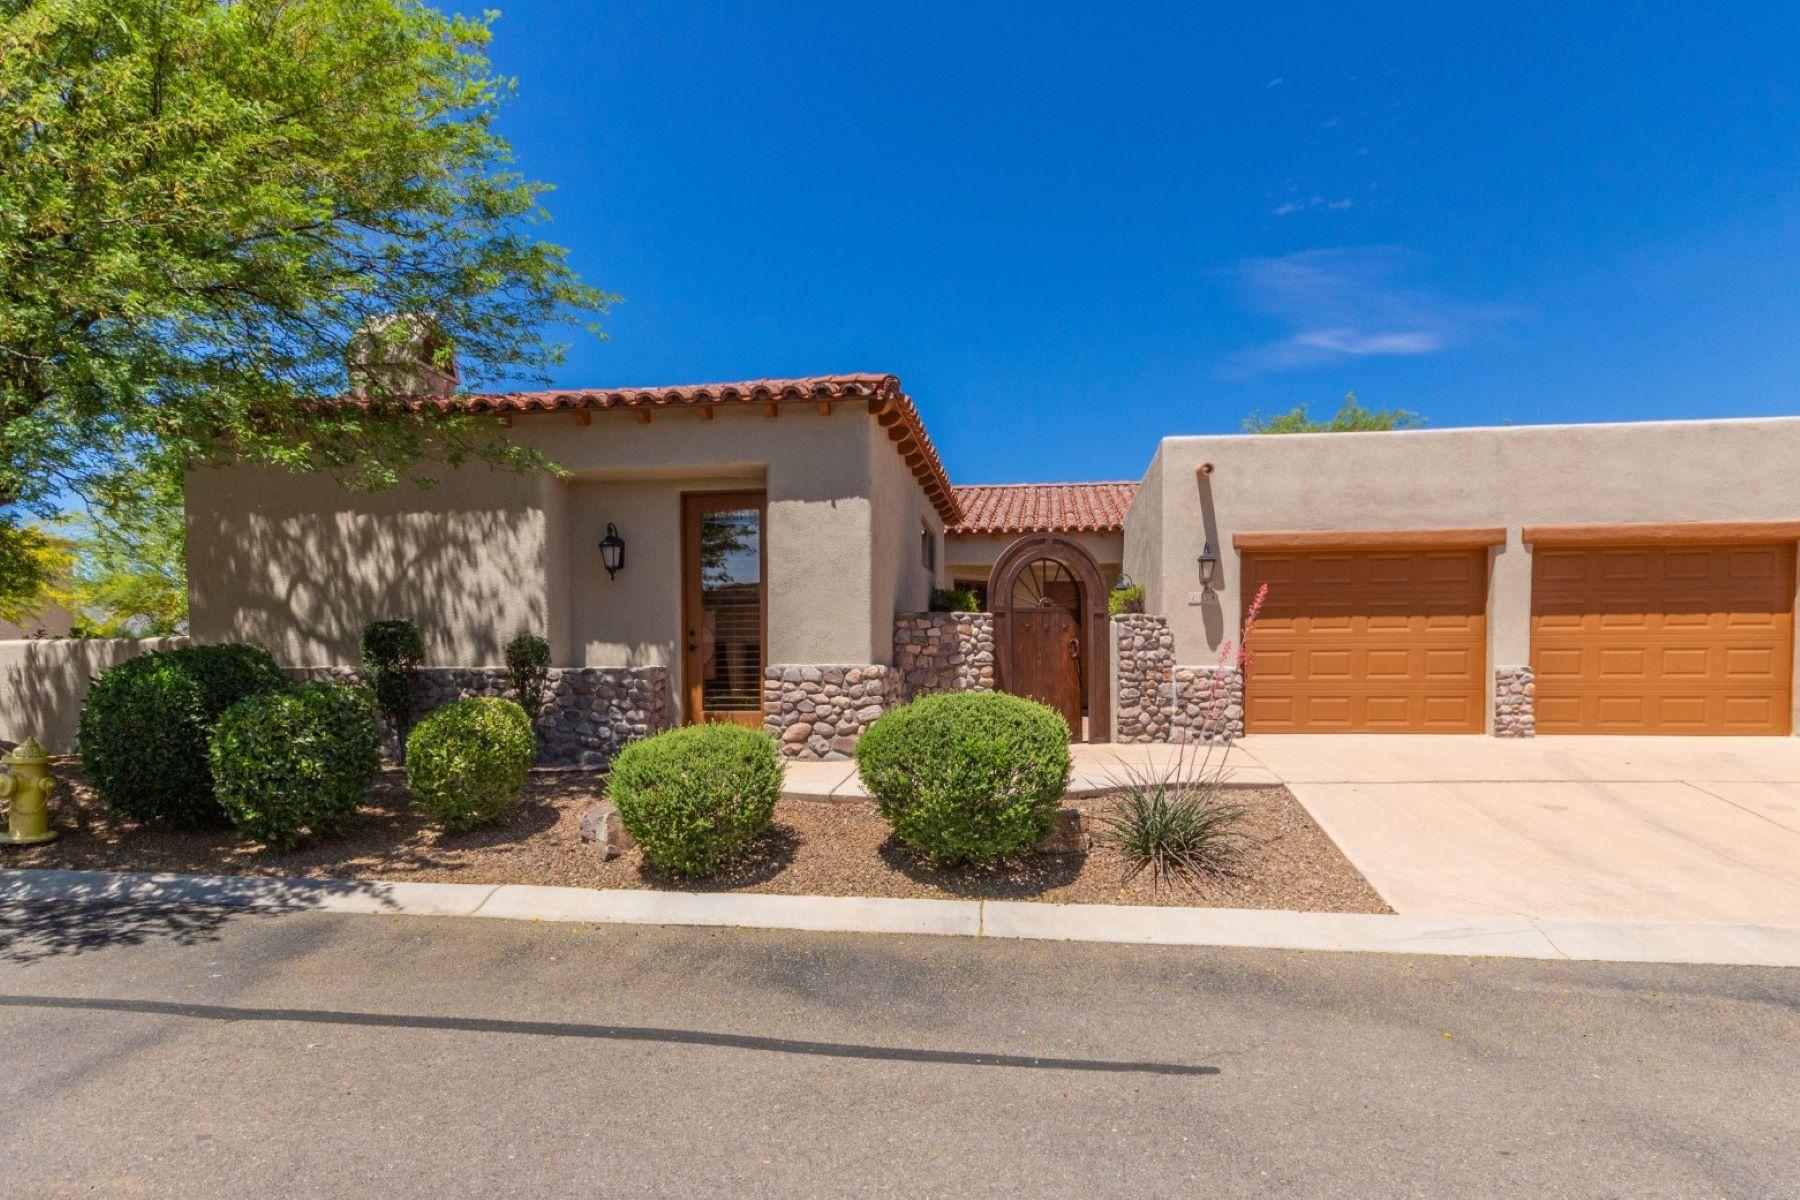 single family homes for Active at Gently Used & Beautifully Upgraded 218 Circulo Veranera Tubac, Arizona 85646 United States